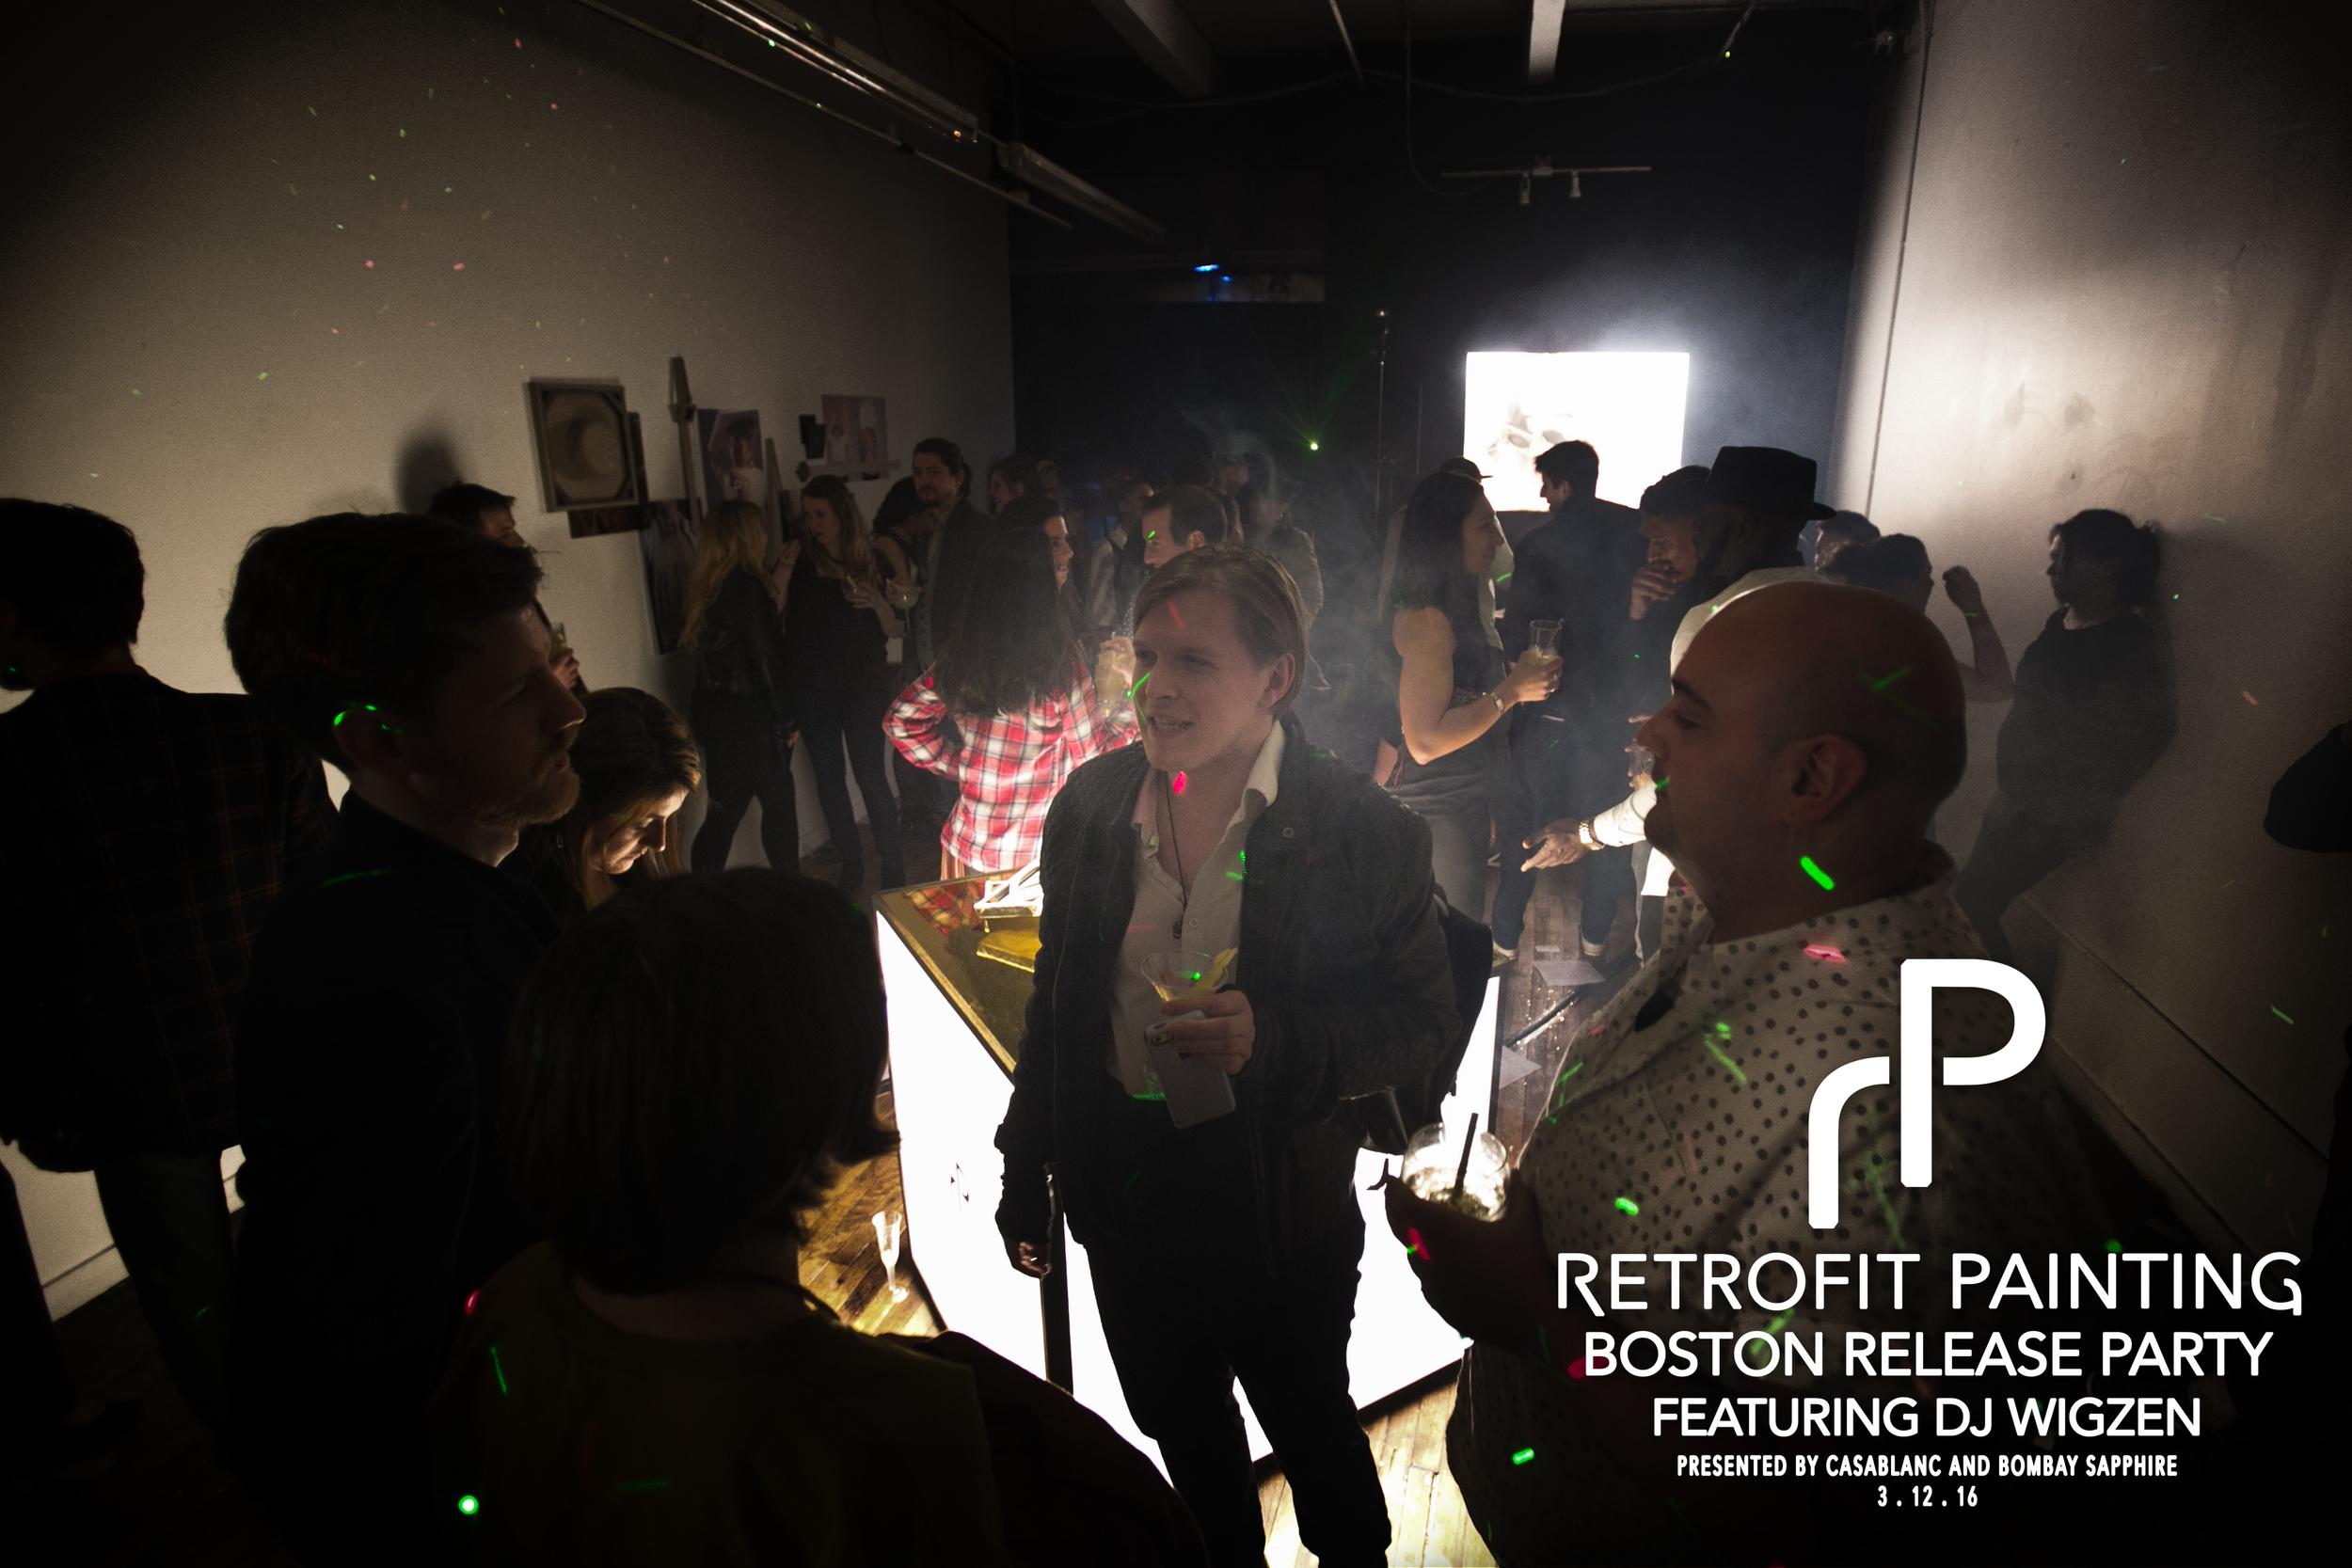 Retrofit Painting Boston Release Party 0211.jpg